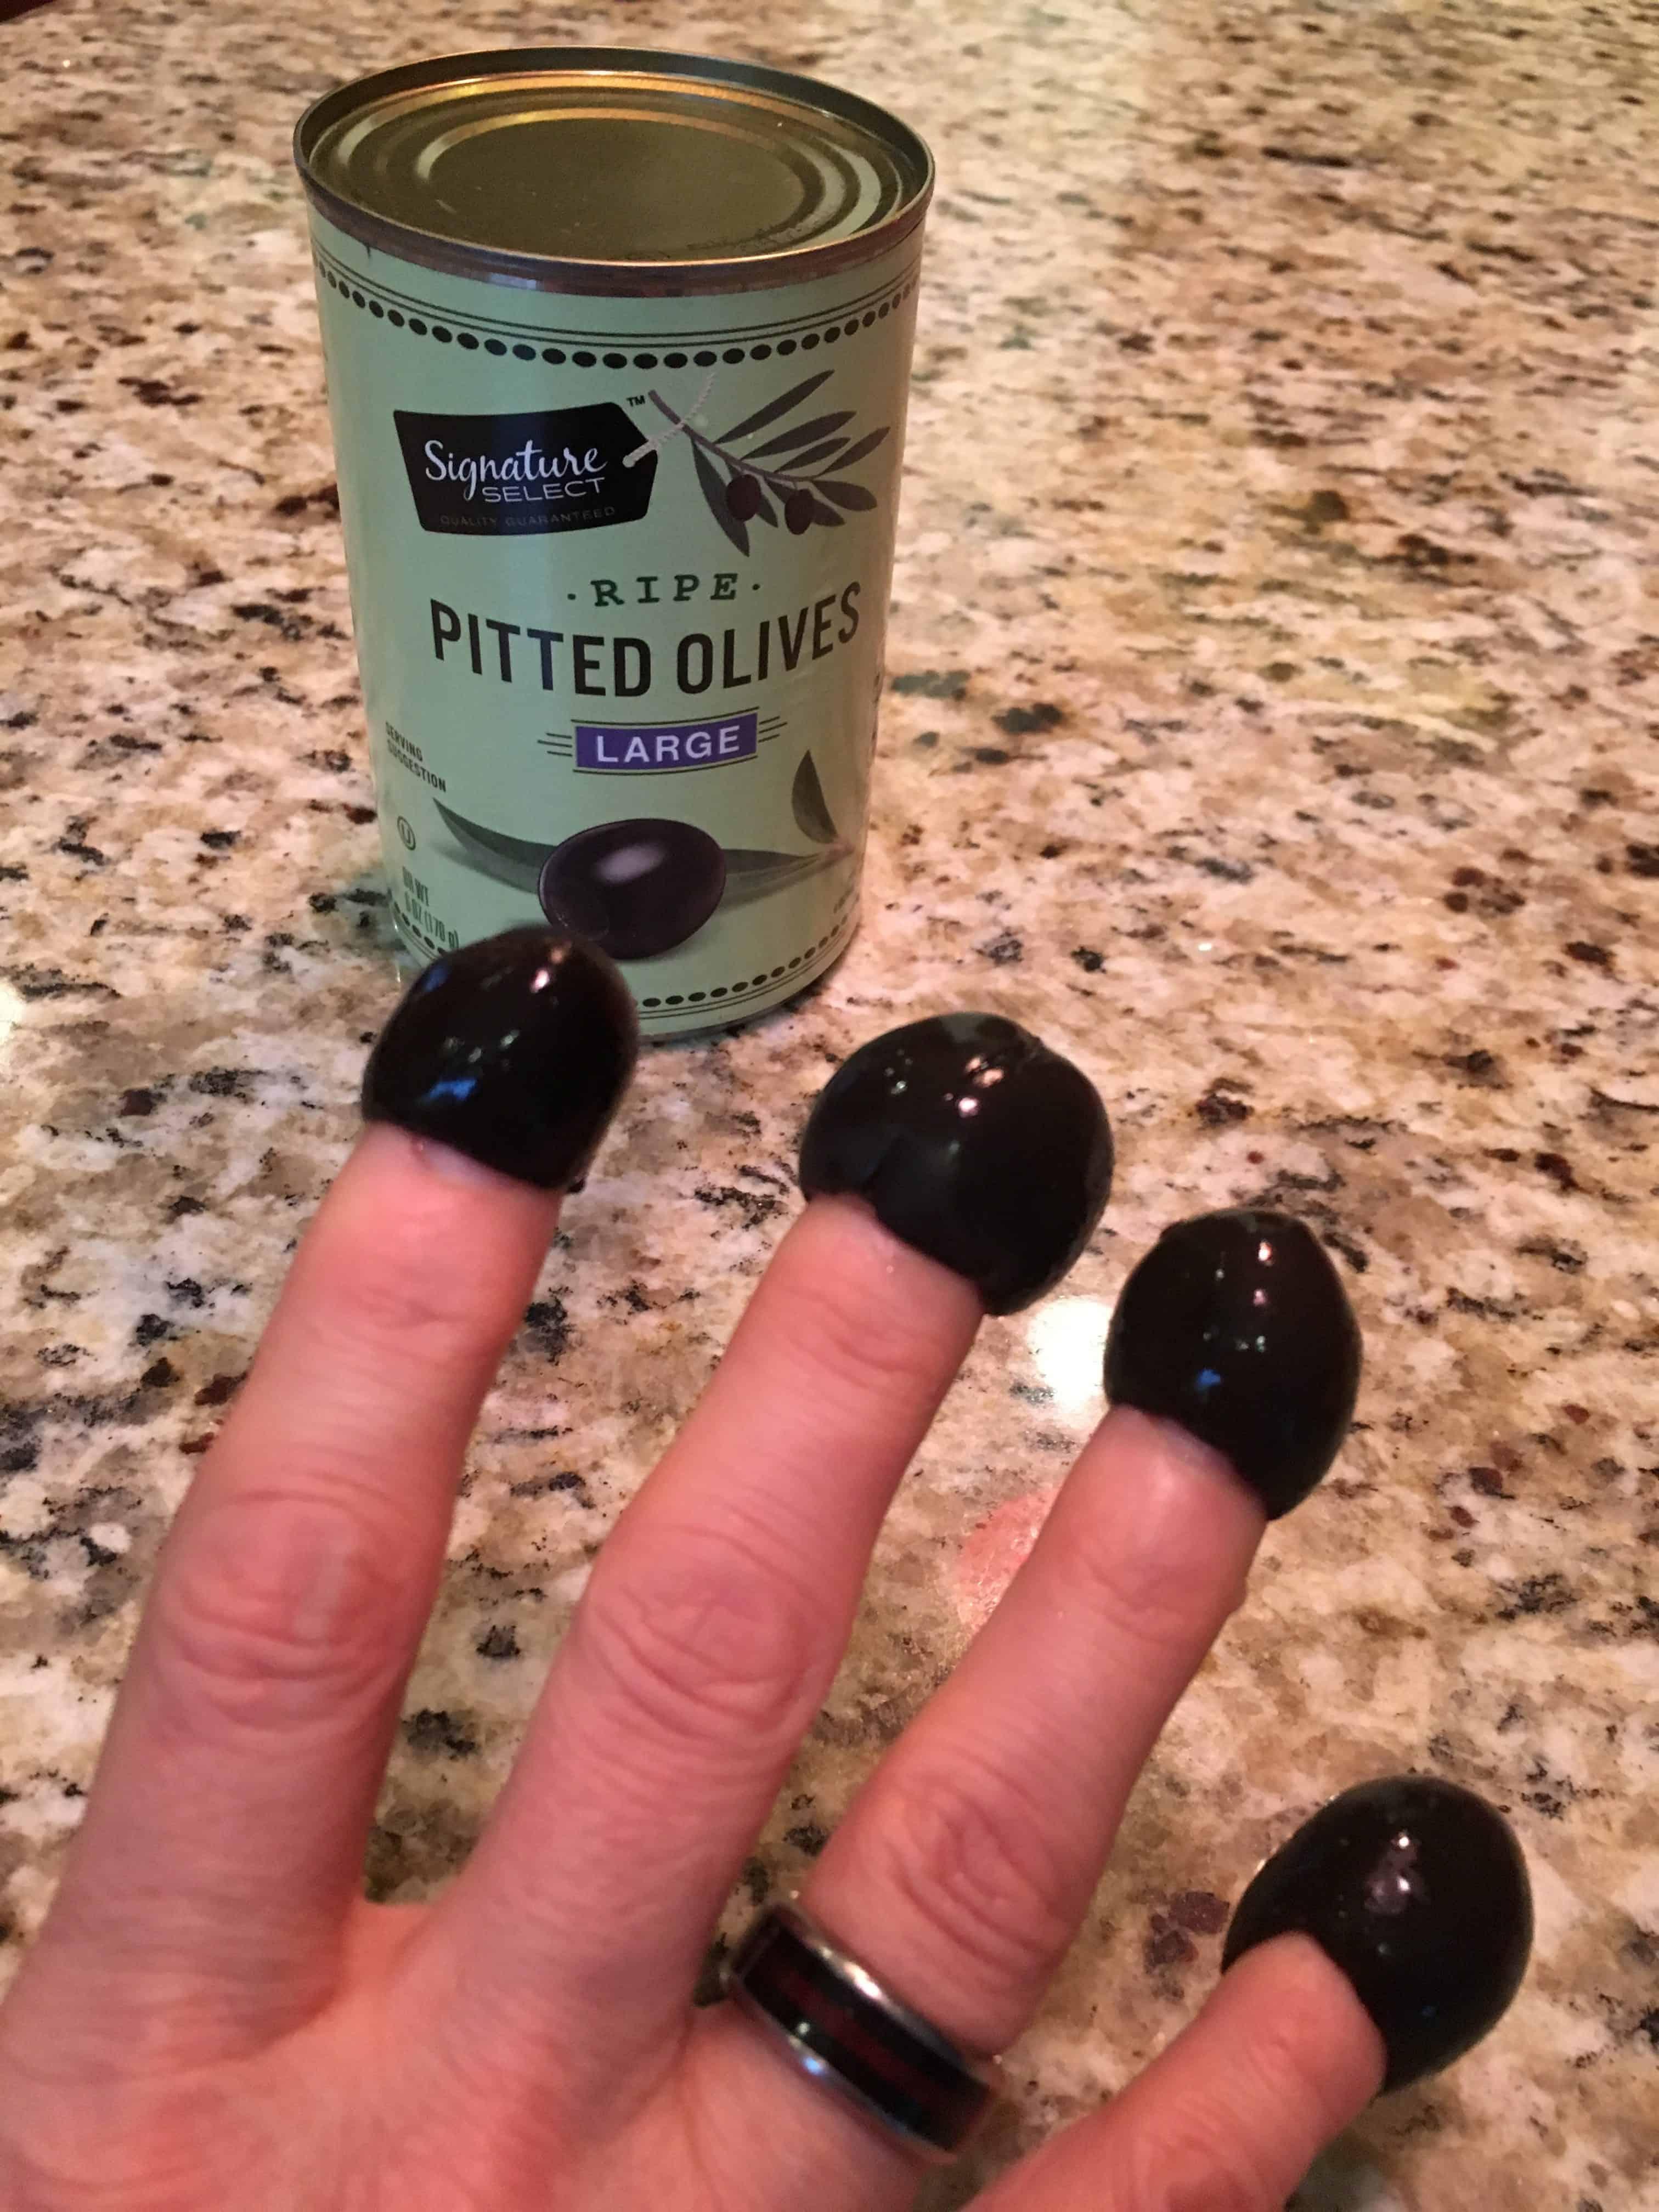 Olive fingers. https://trimazing.com